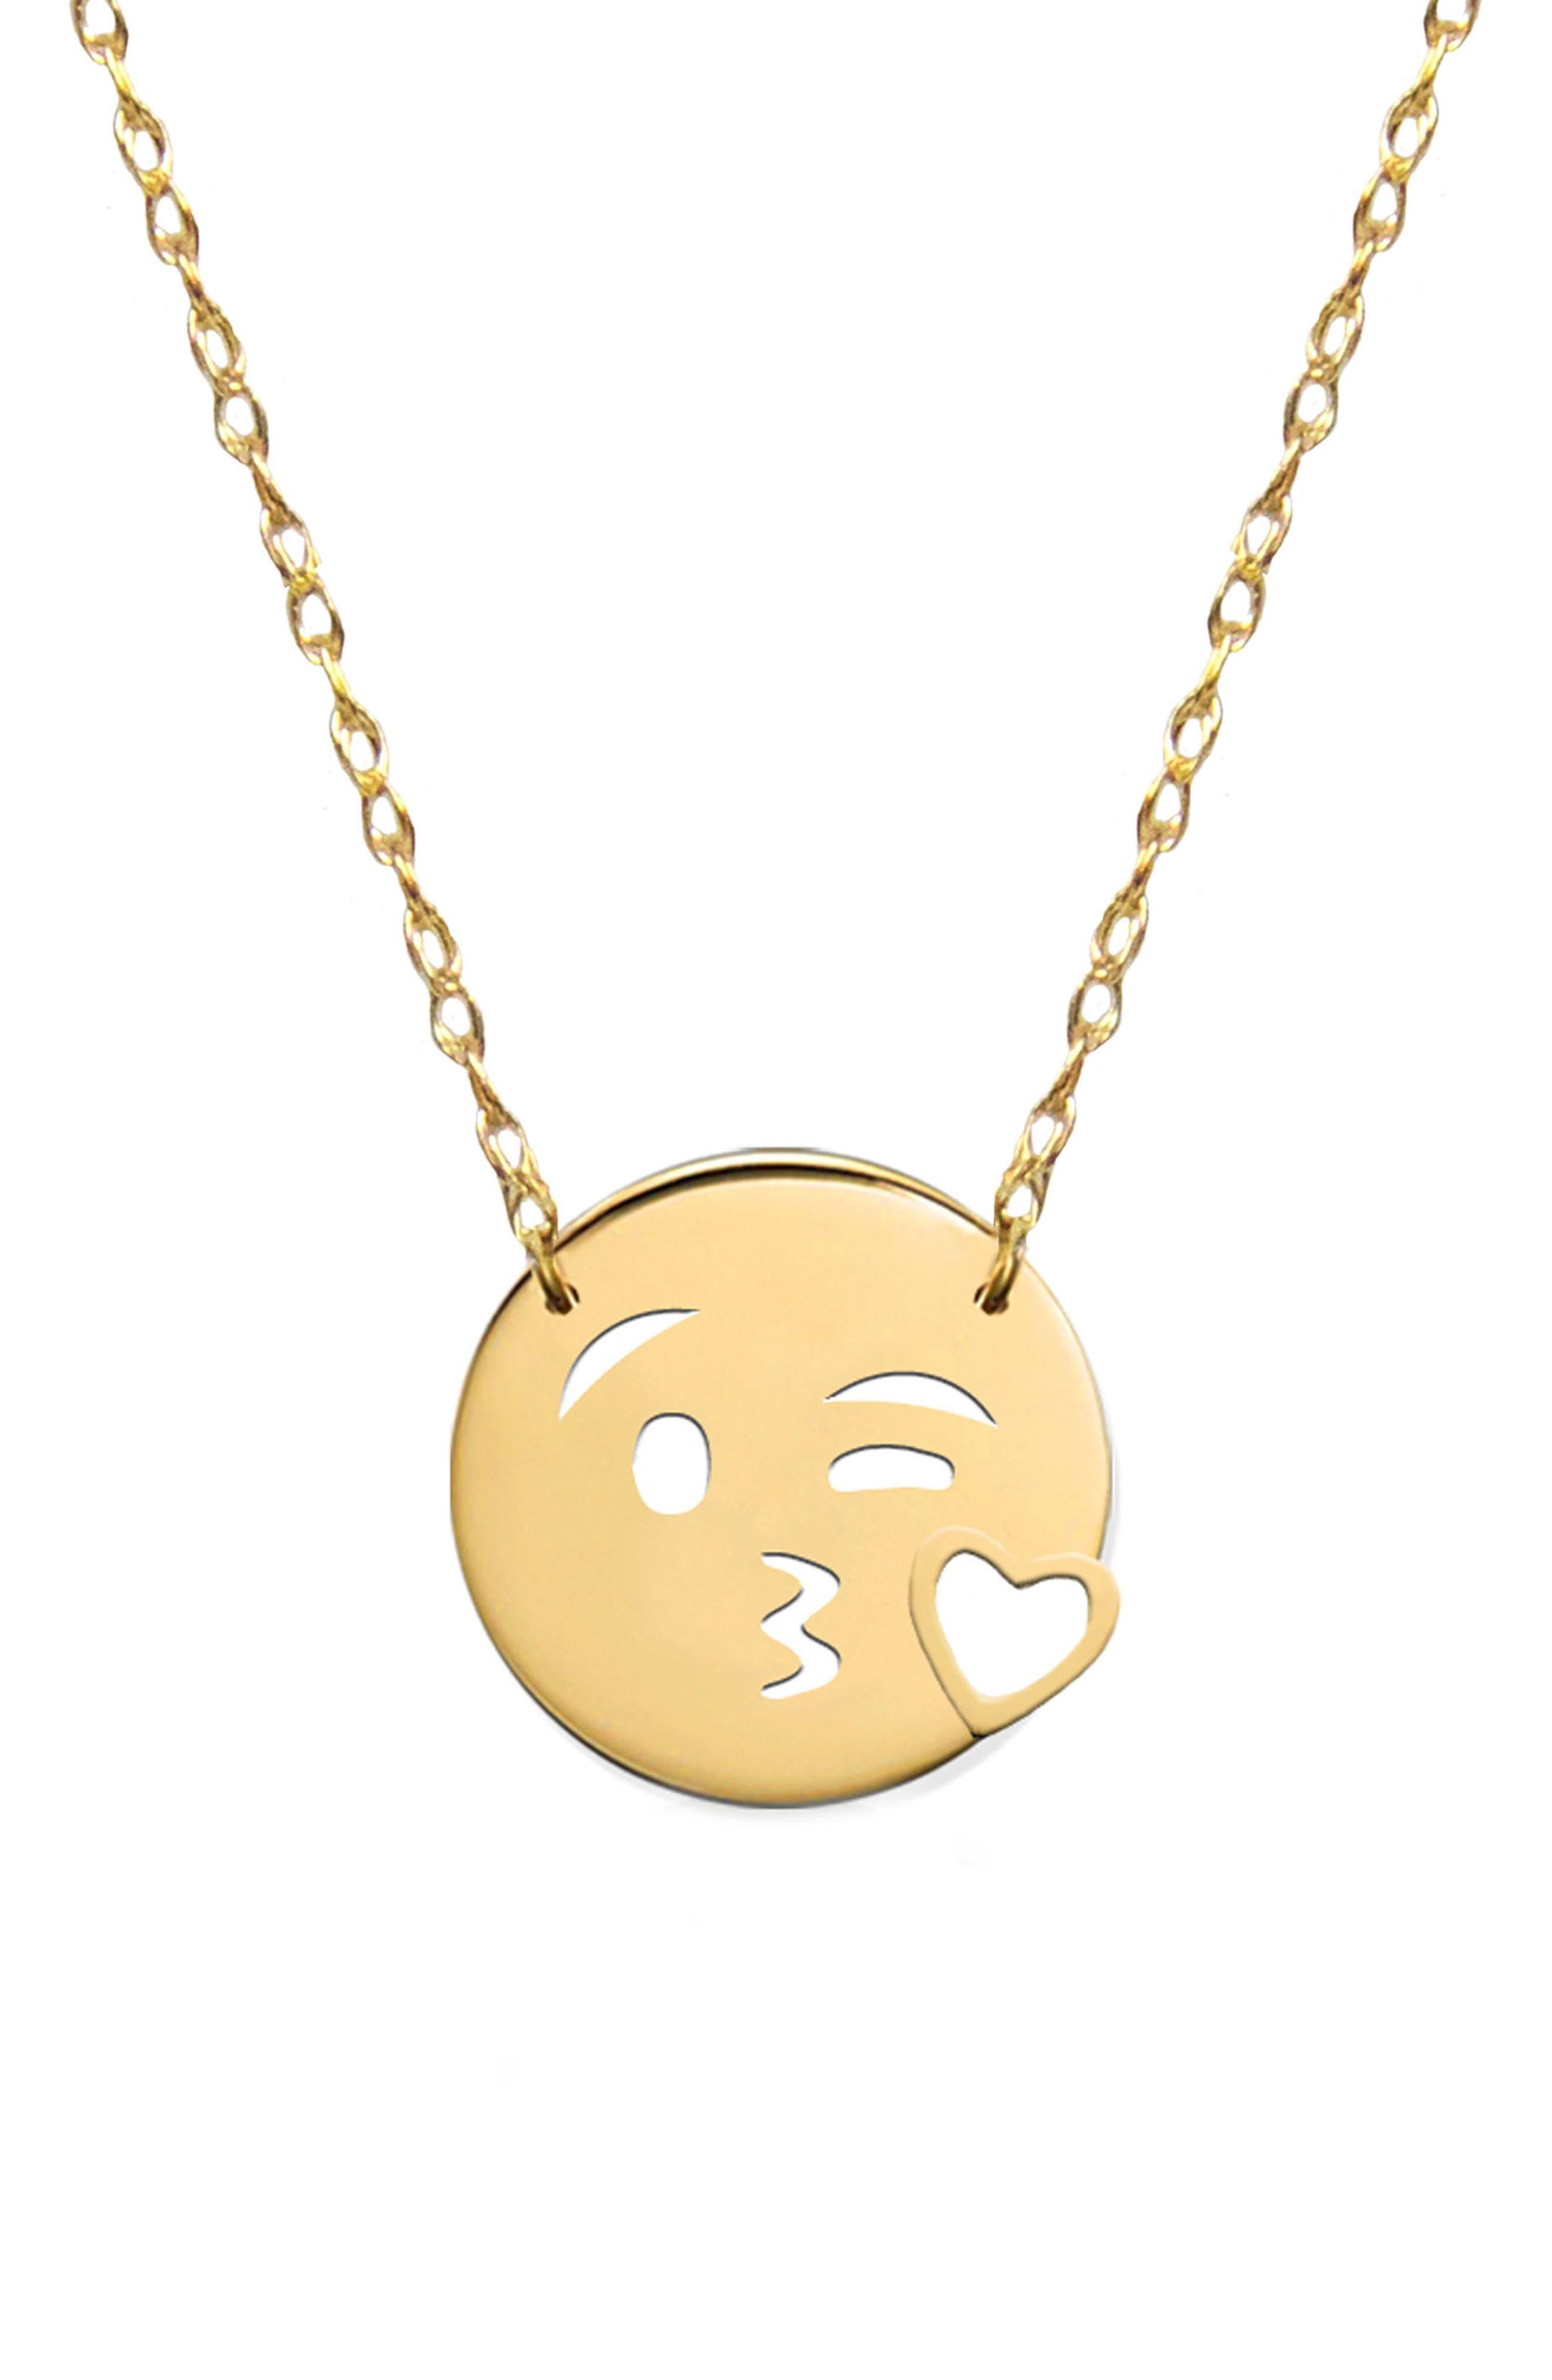 Main Image - Jane Basch Designs Kiss Love Emoji Pendant Necklace (Nordstrom Exclusive)